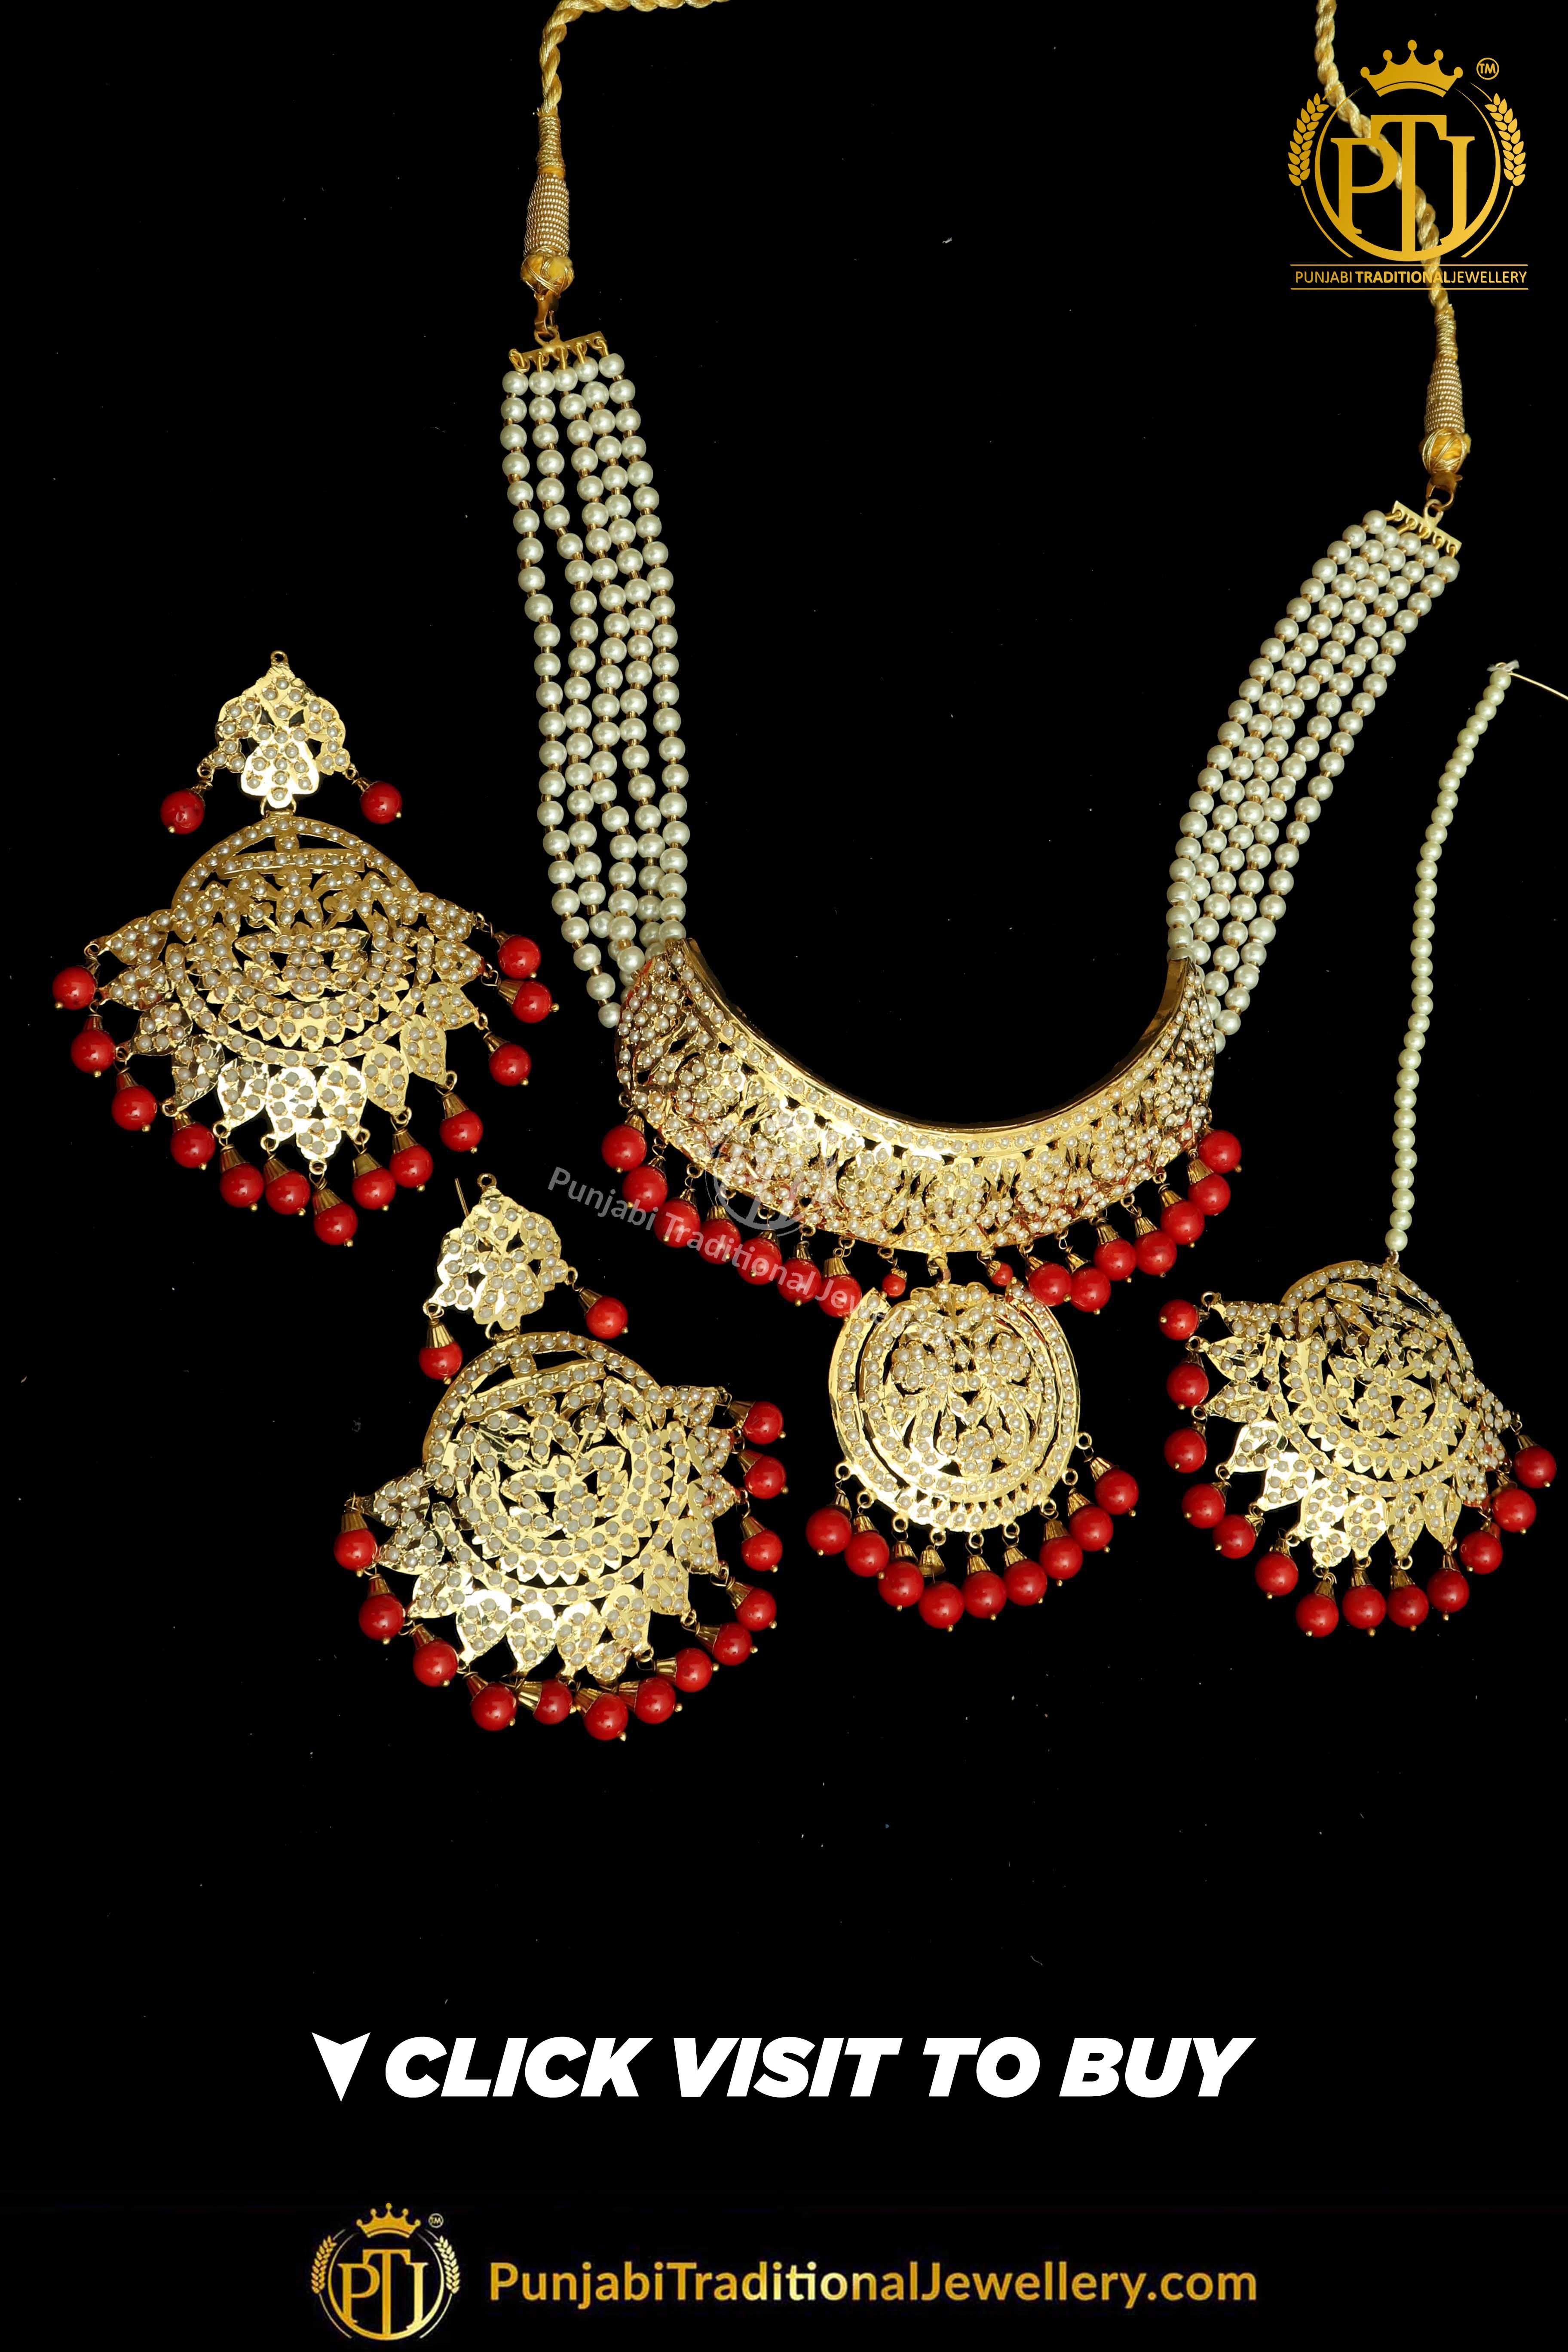 00d878f8f Punjabi Traditional Jewellery · Necklace Set · Chokers · Pinterest:  @PunjabiJewellery Gold Finished Red Jadau Choker Necklace Set You may  visit: http